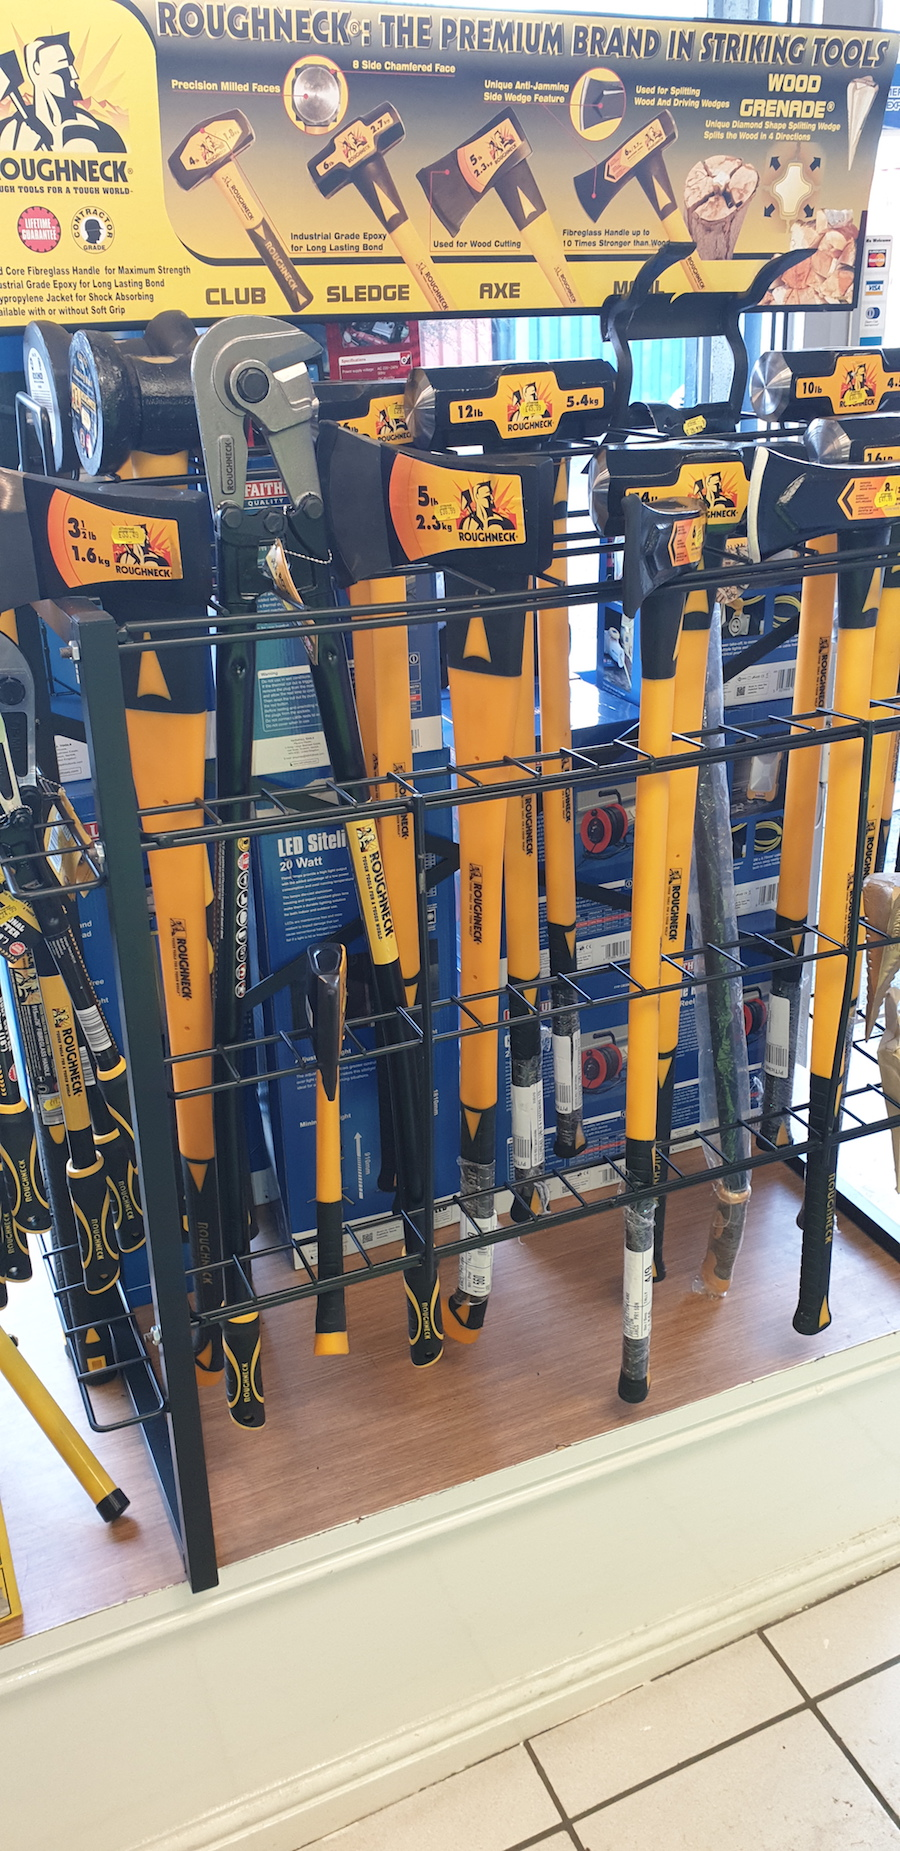 roughneck striking tools